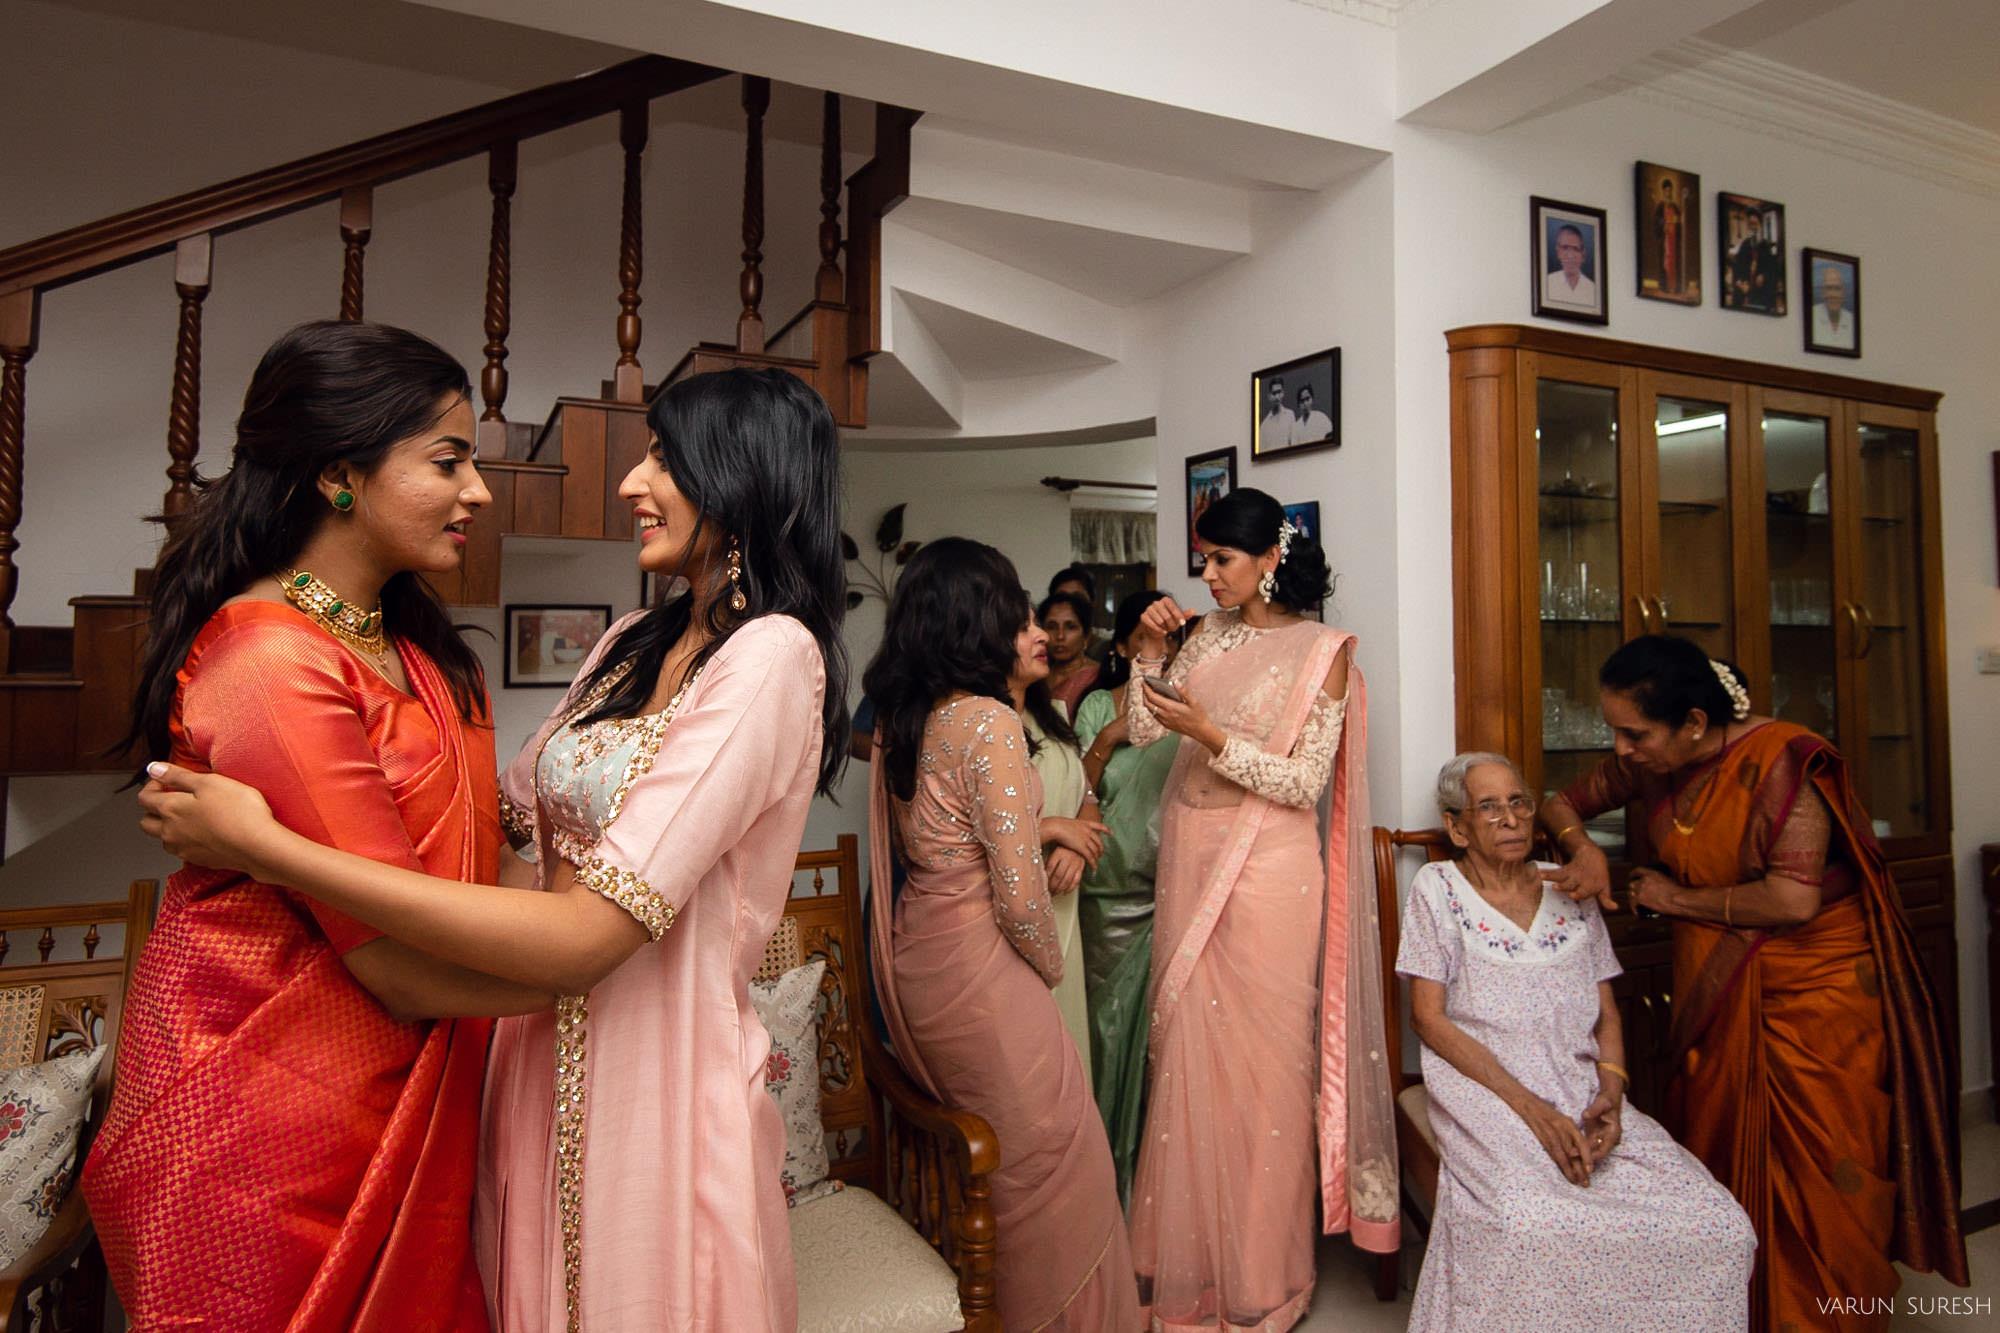 Sunithu_179.jpg